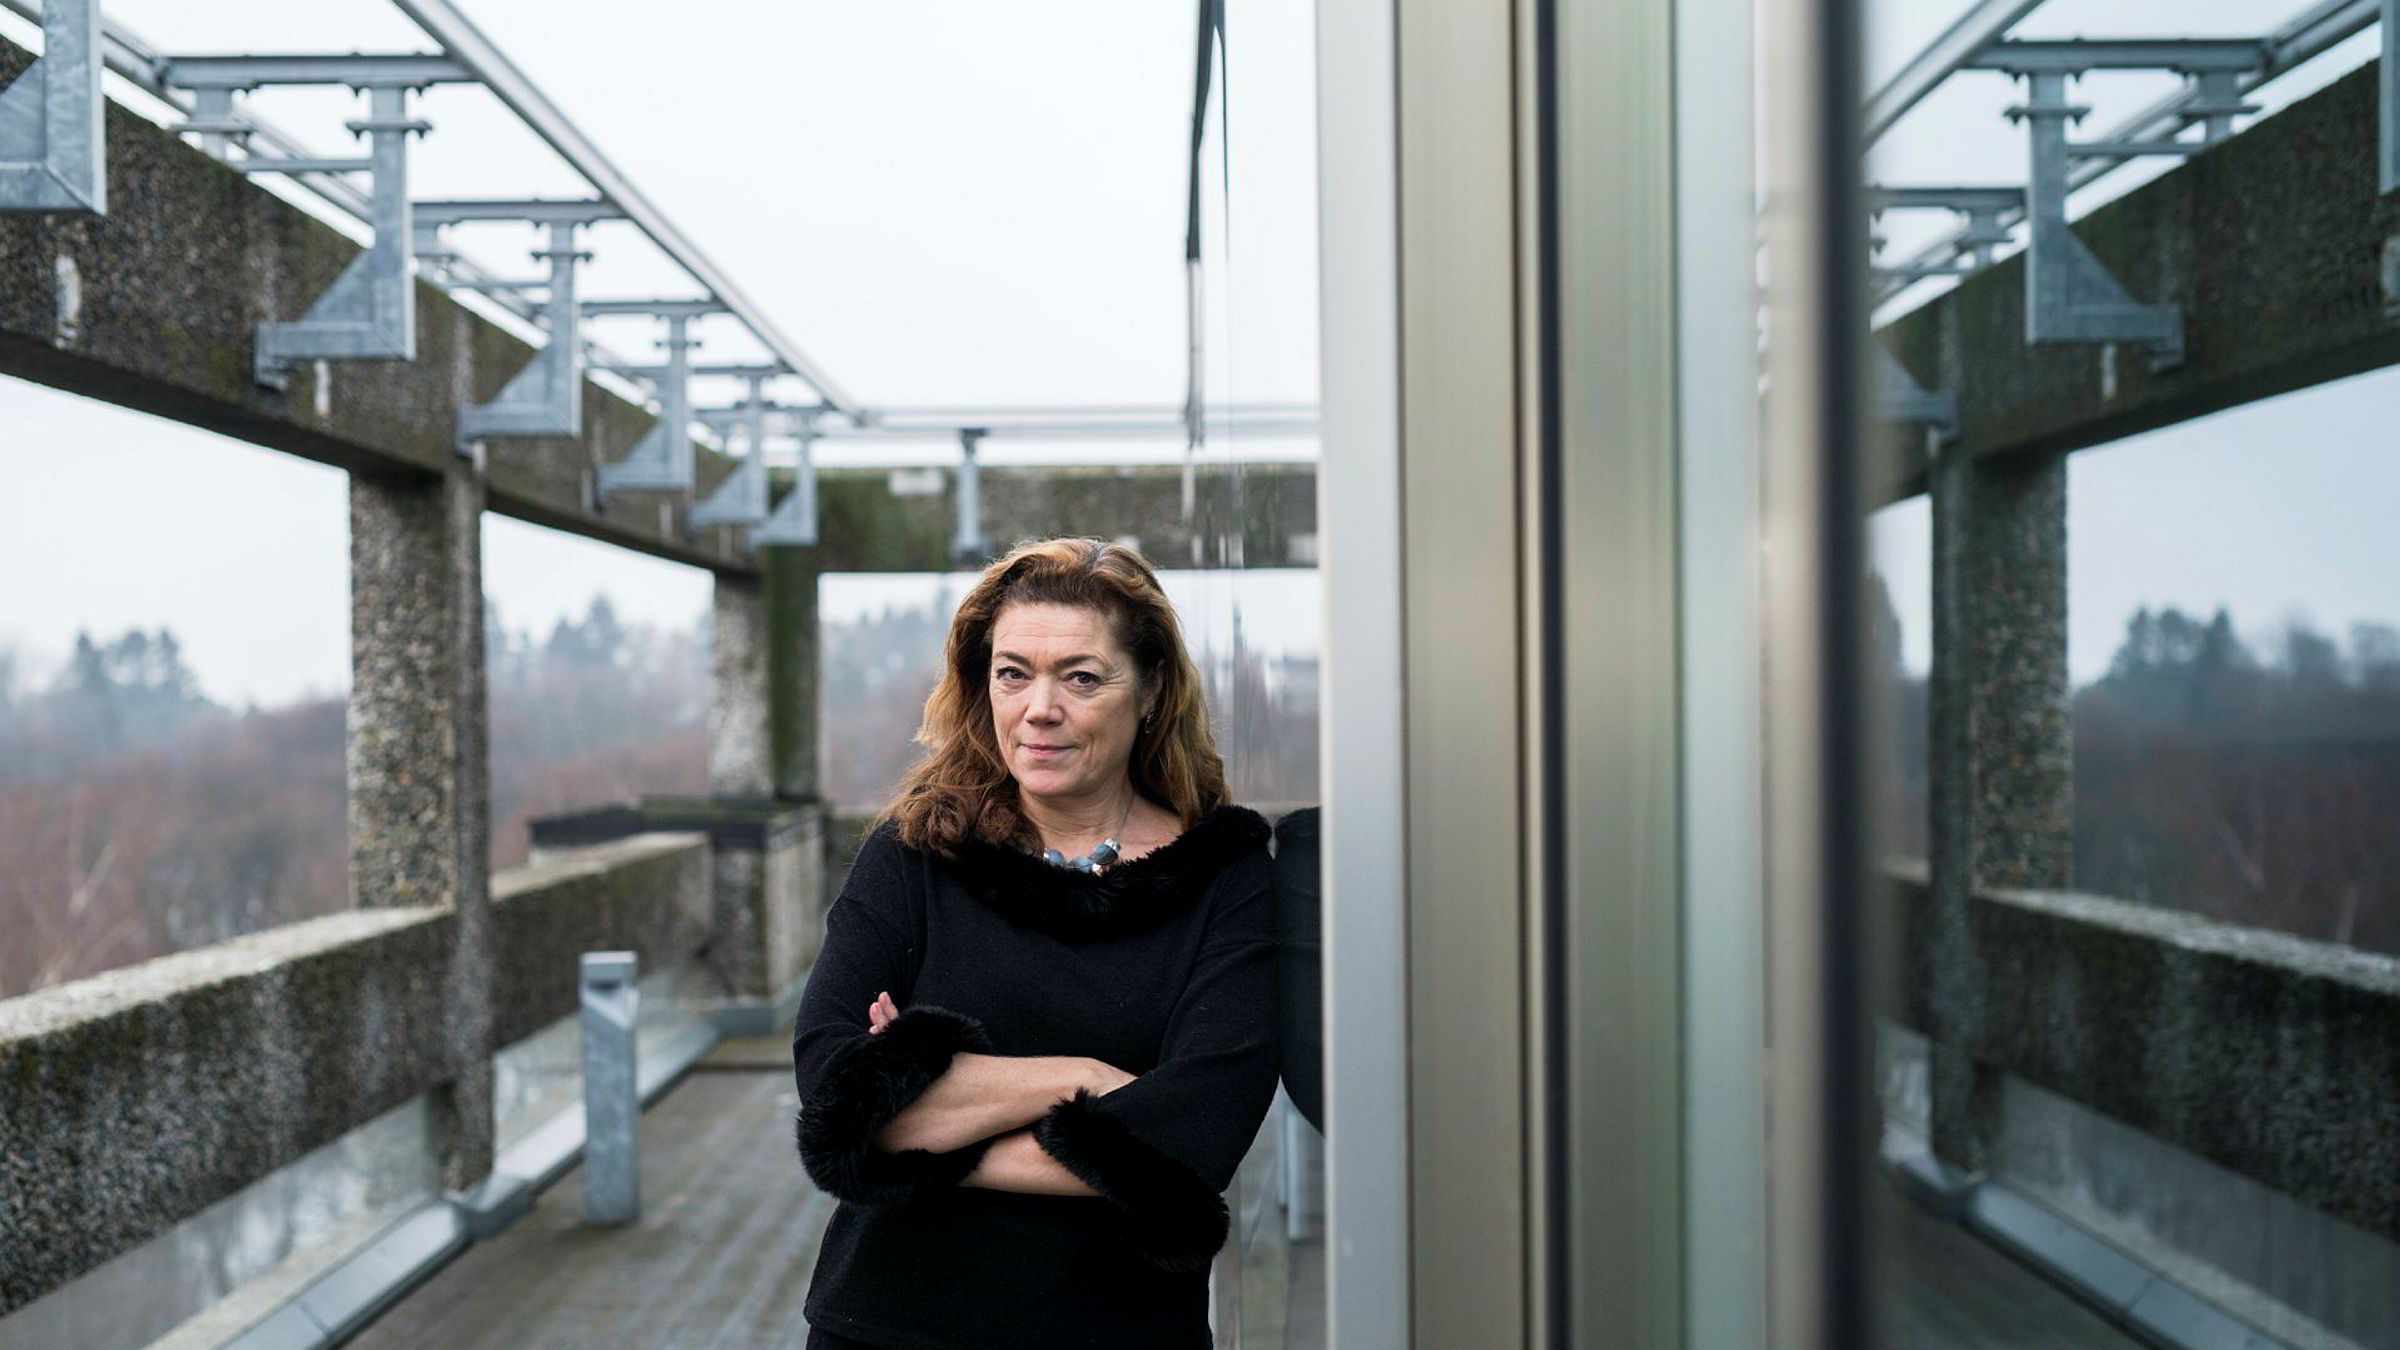 NHO-leder Kristin Skogen Lund vil ha en ny Afp-ordning, men ikke betale mer for den.